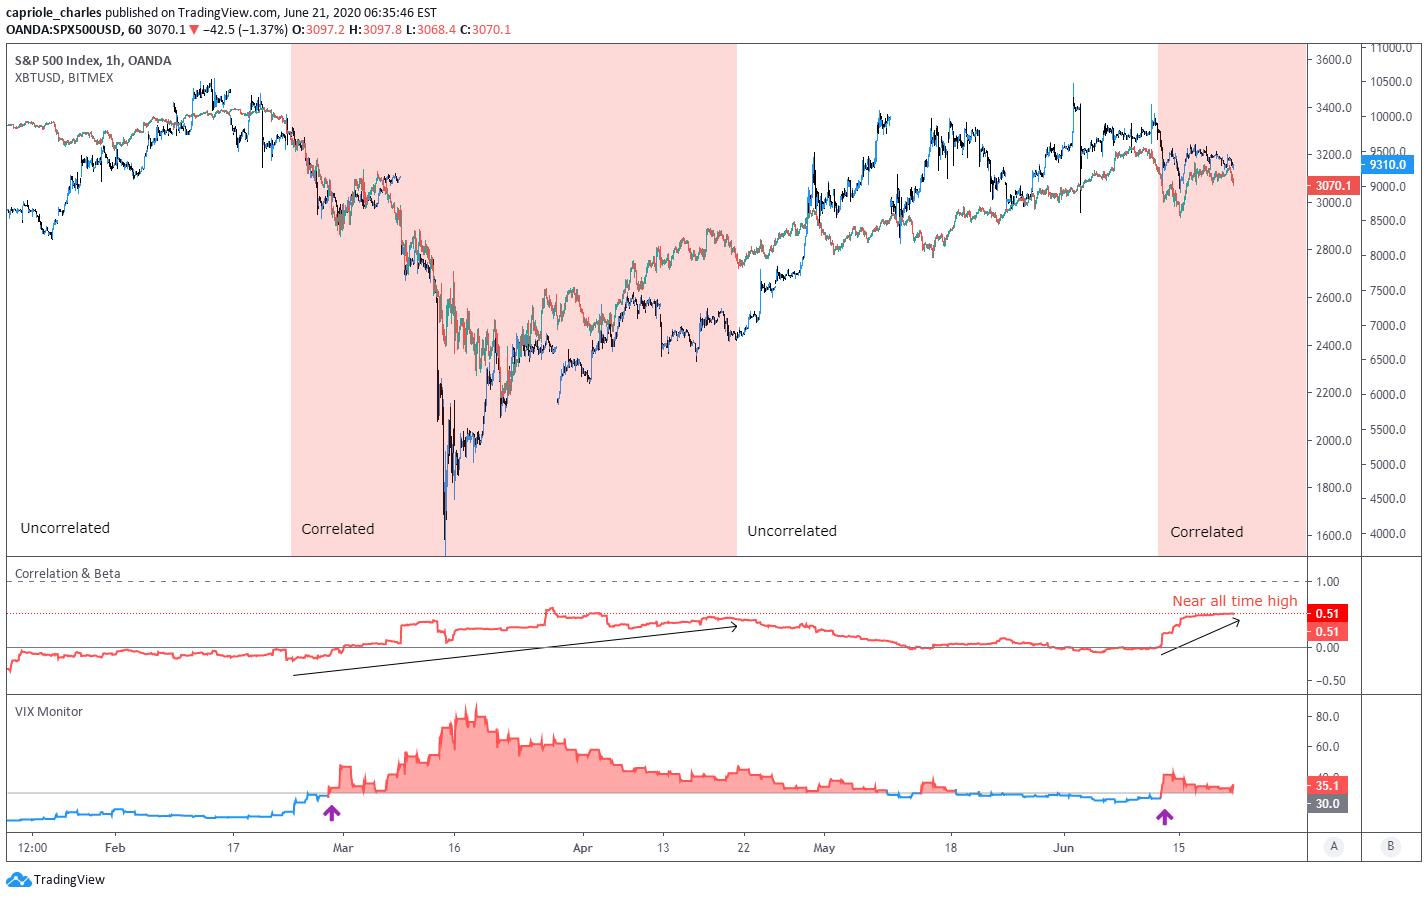 STOCK BTC Correlation